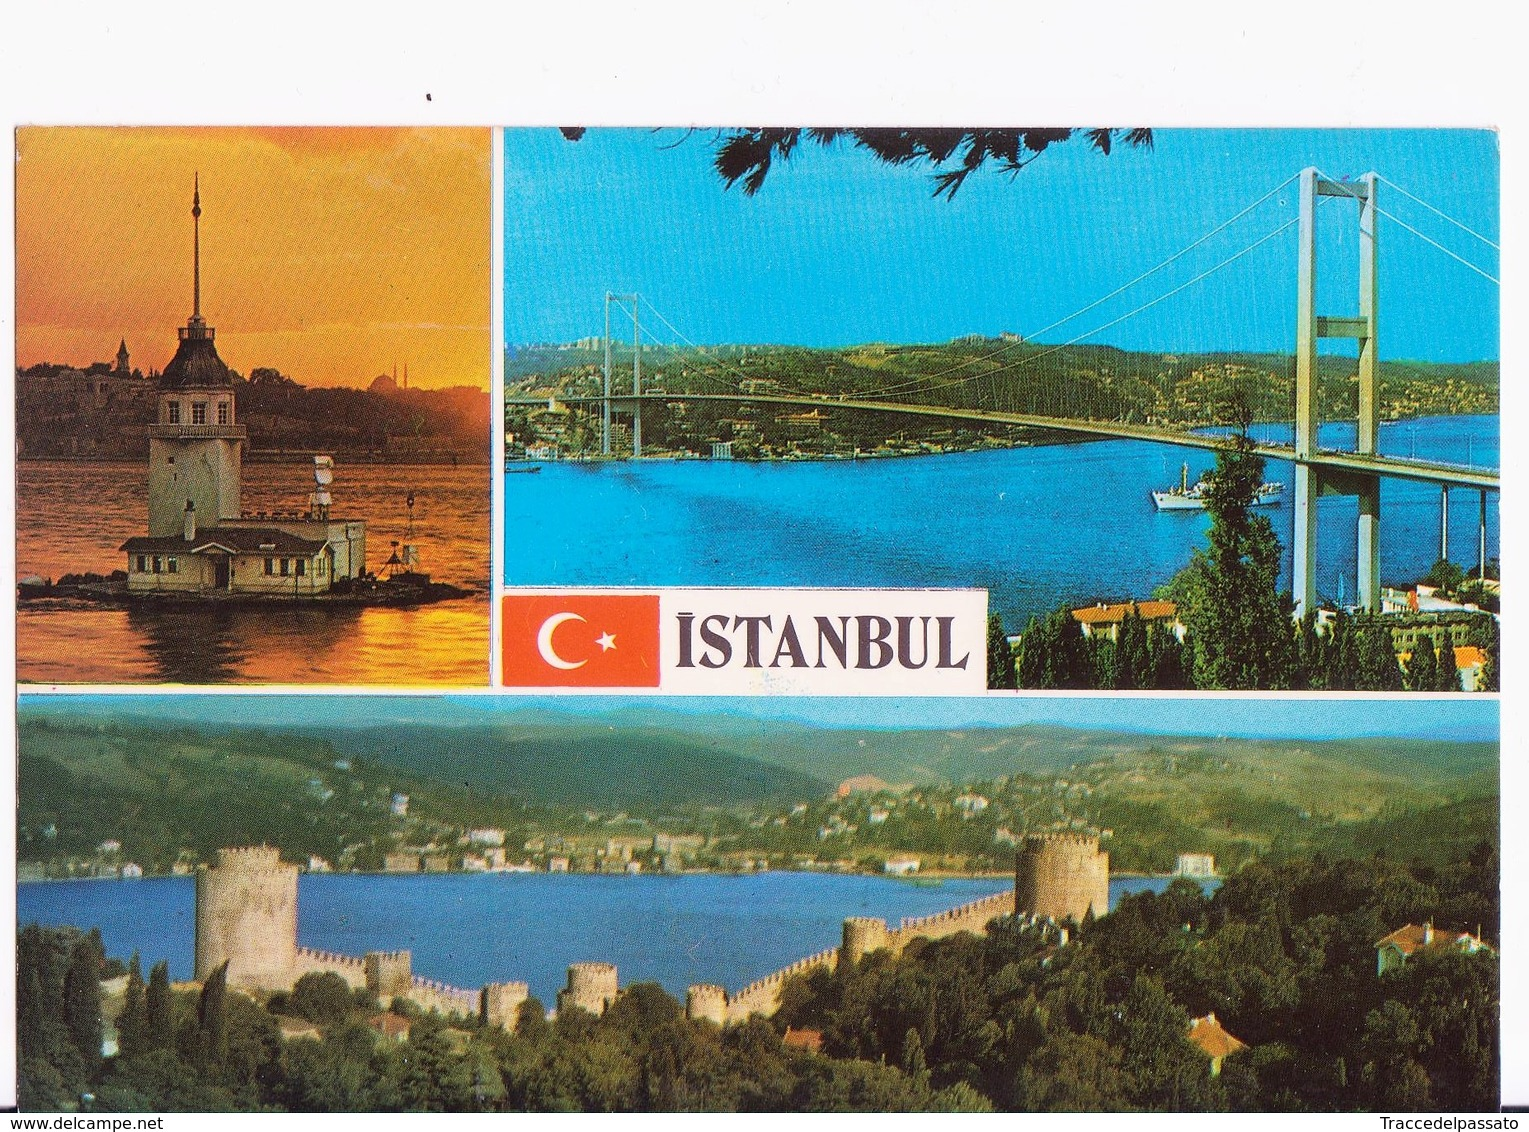 CARTOLINA TURCHIA ISTANBUL - VEDUTE - POSTCARD VIEWS ISTANBUL - 1970 - Turchia